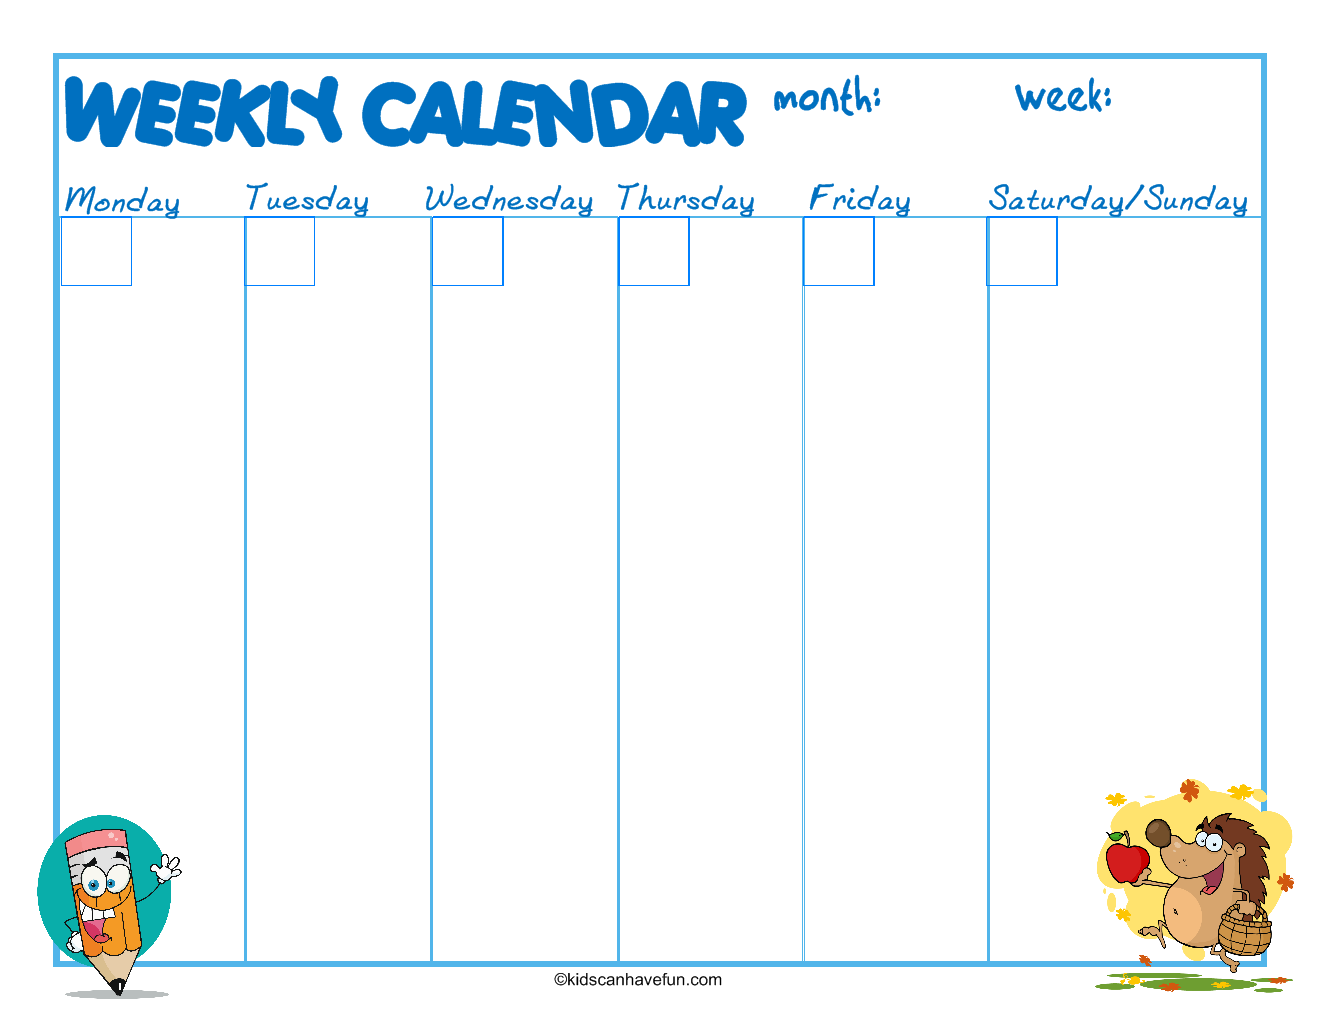 School Weekly Calendar To Record Activities And Homework